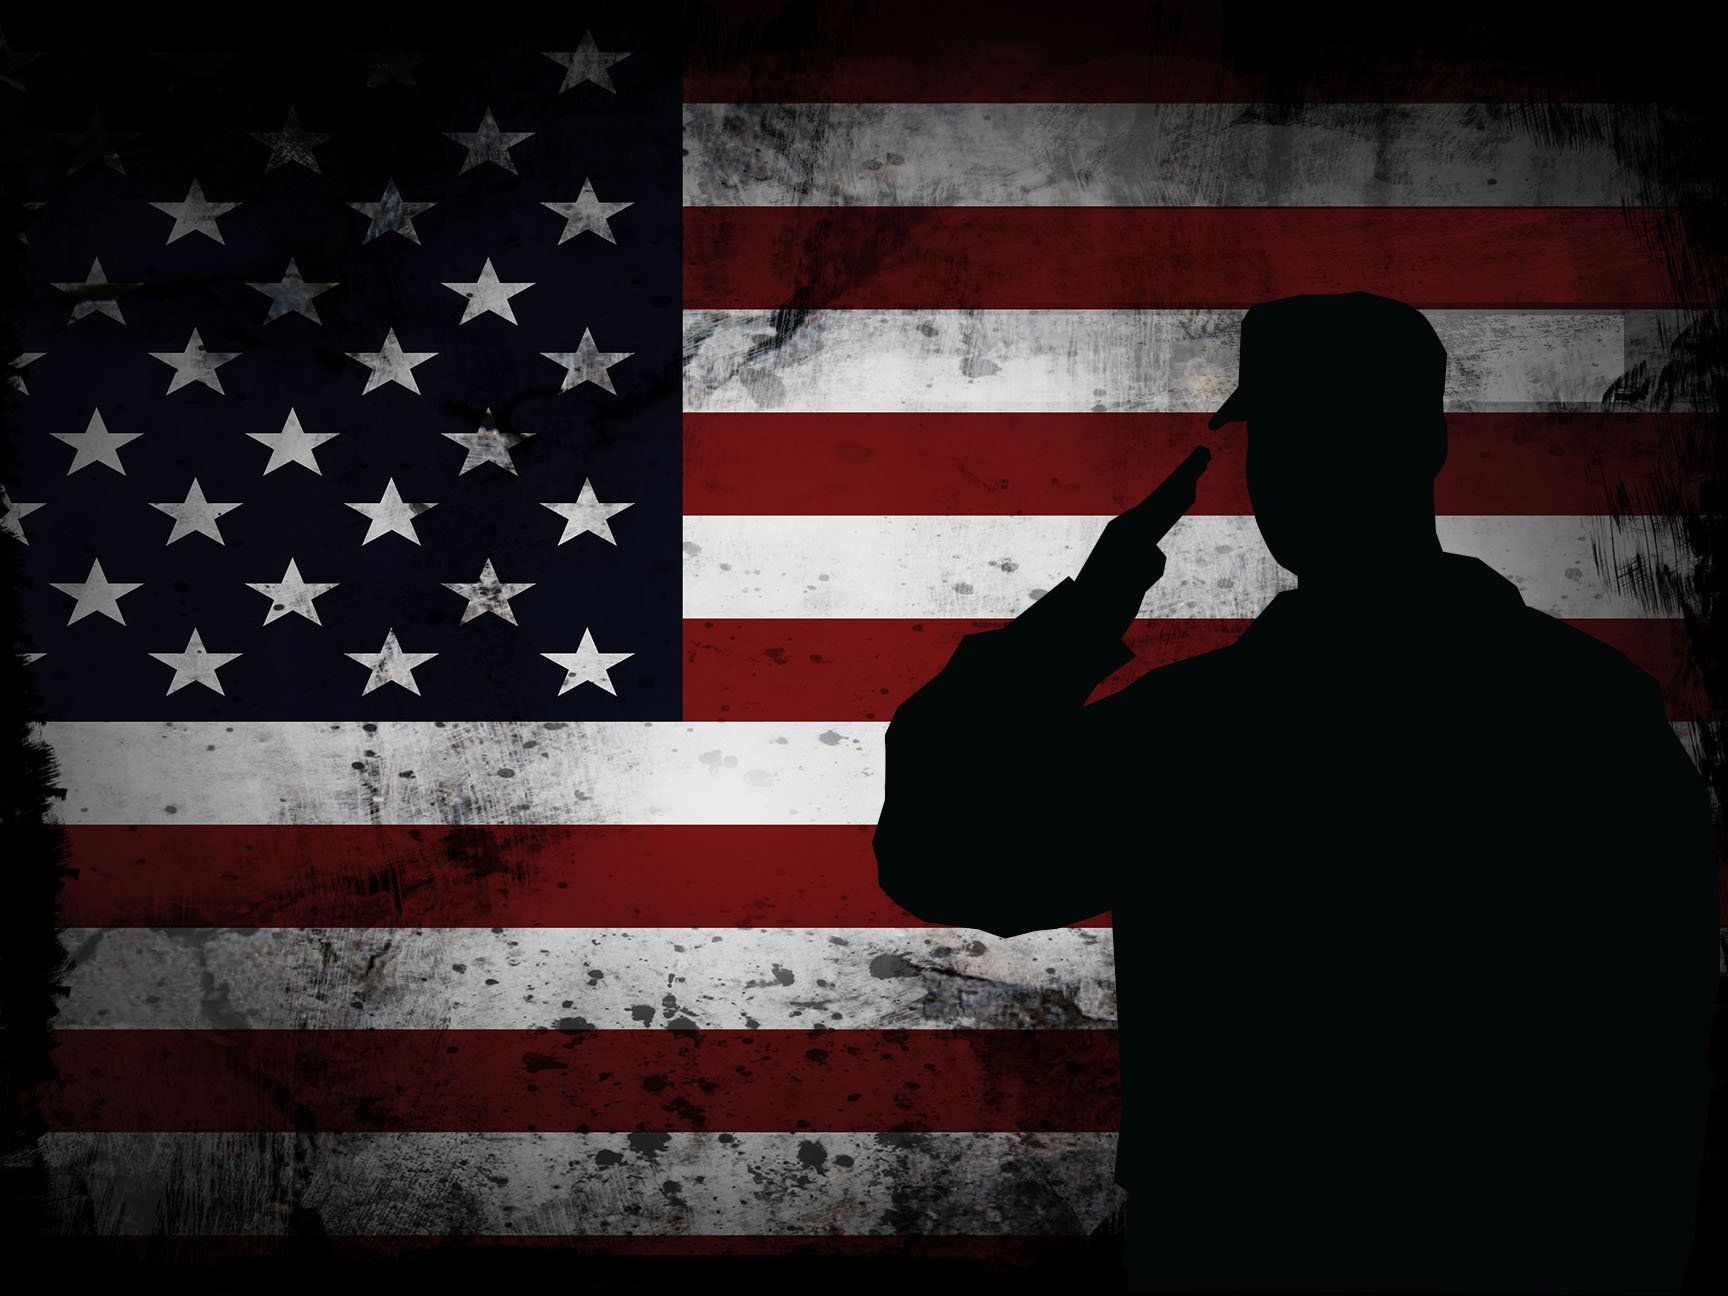 adcadc8e0574 US Marine Saluting the American Flag Military Wall Art Canvas Painting Decor